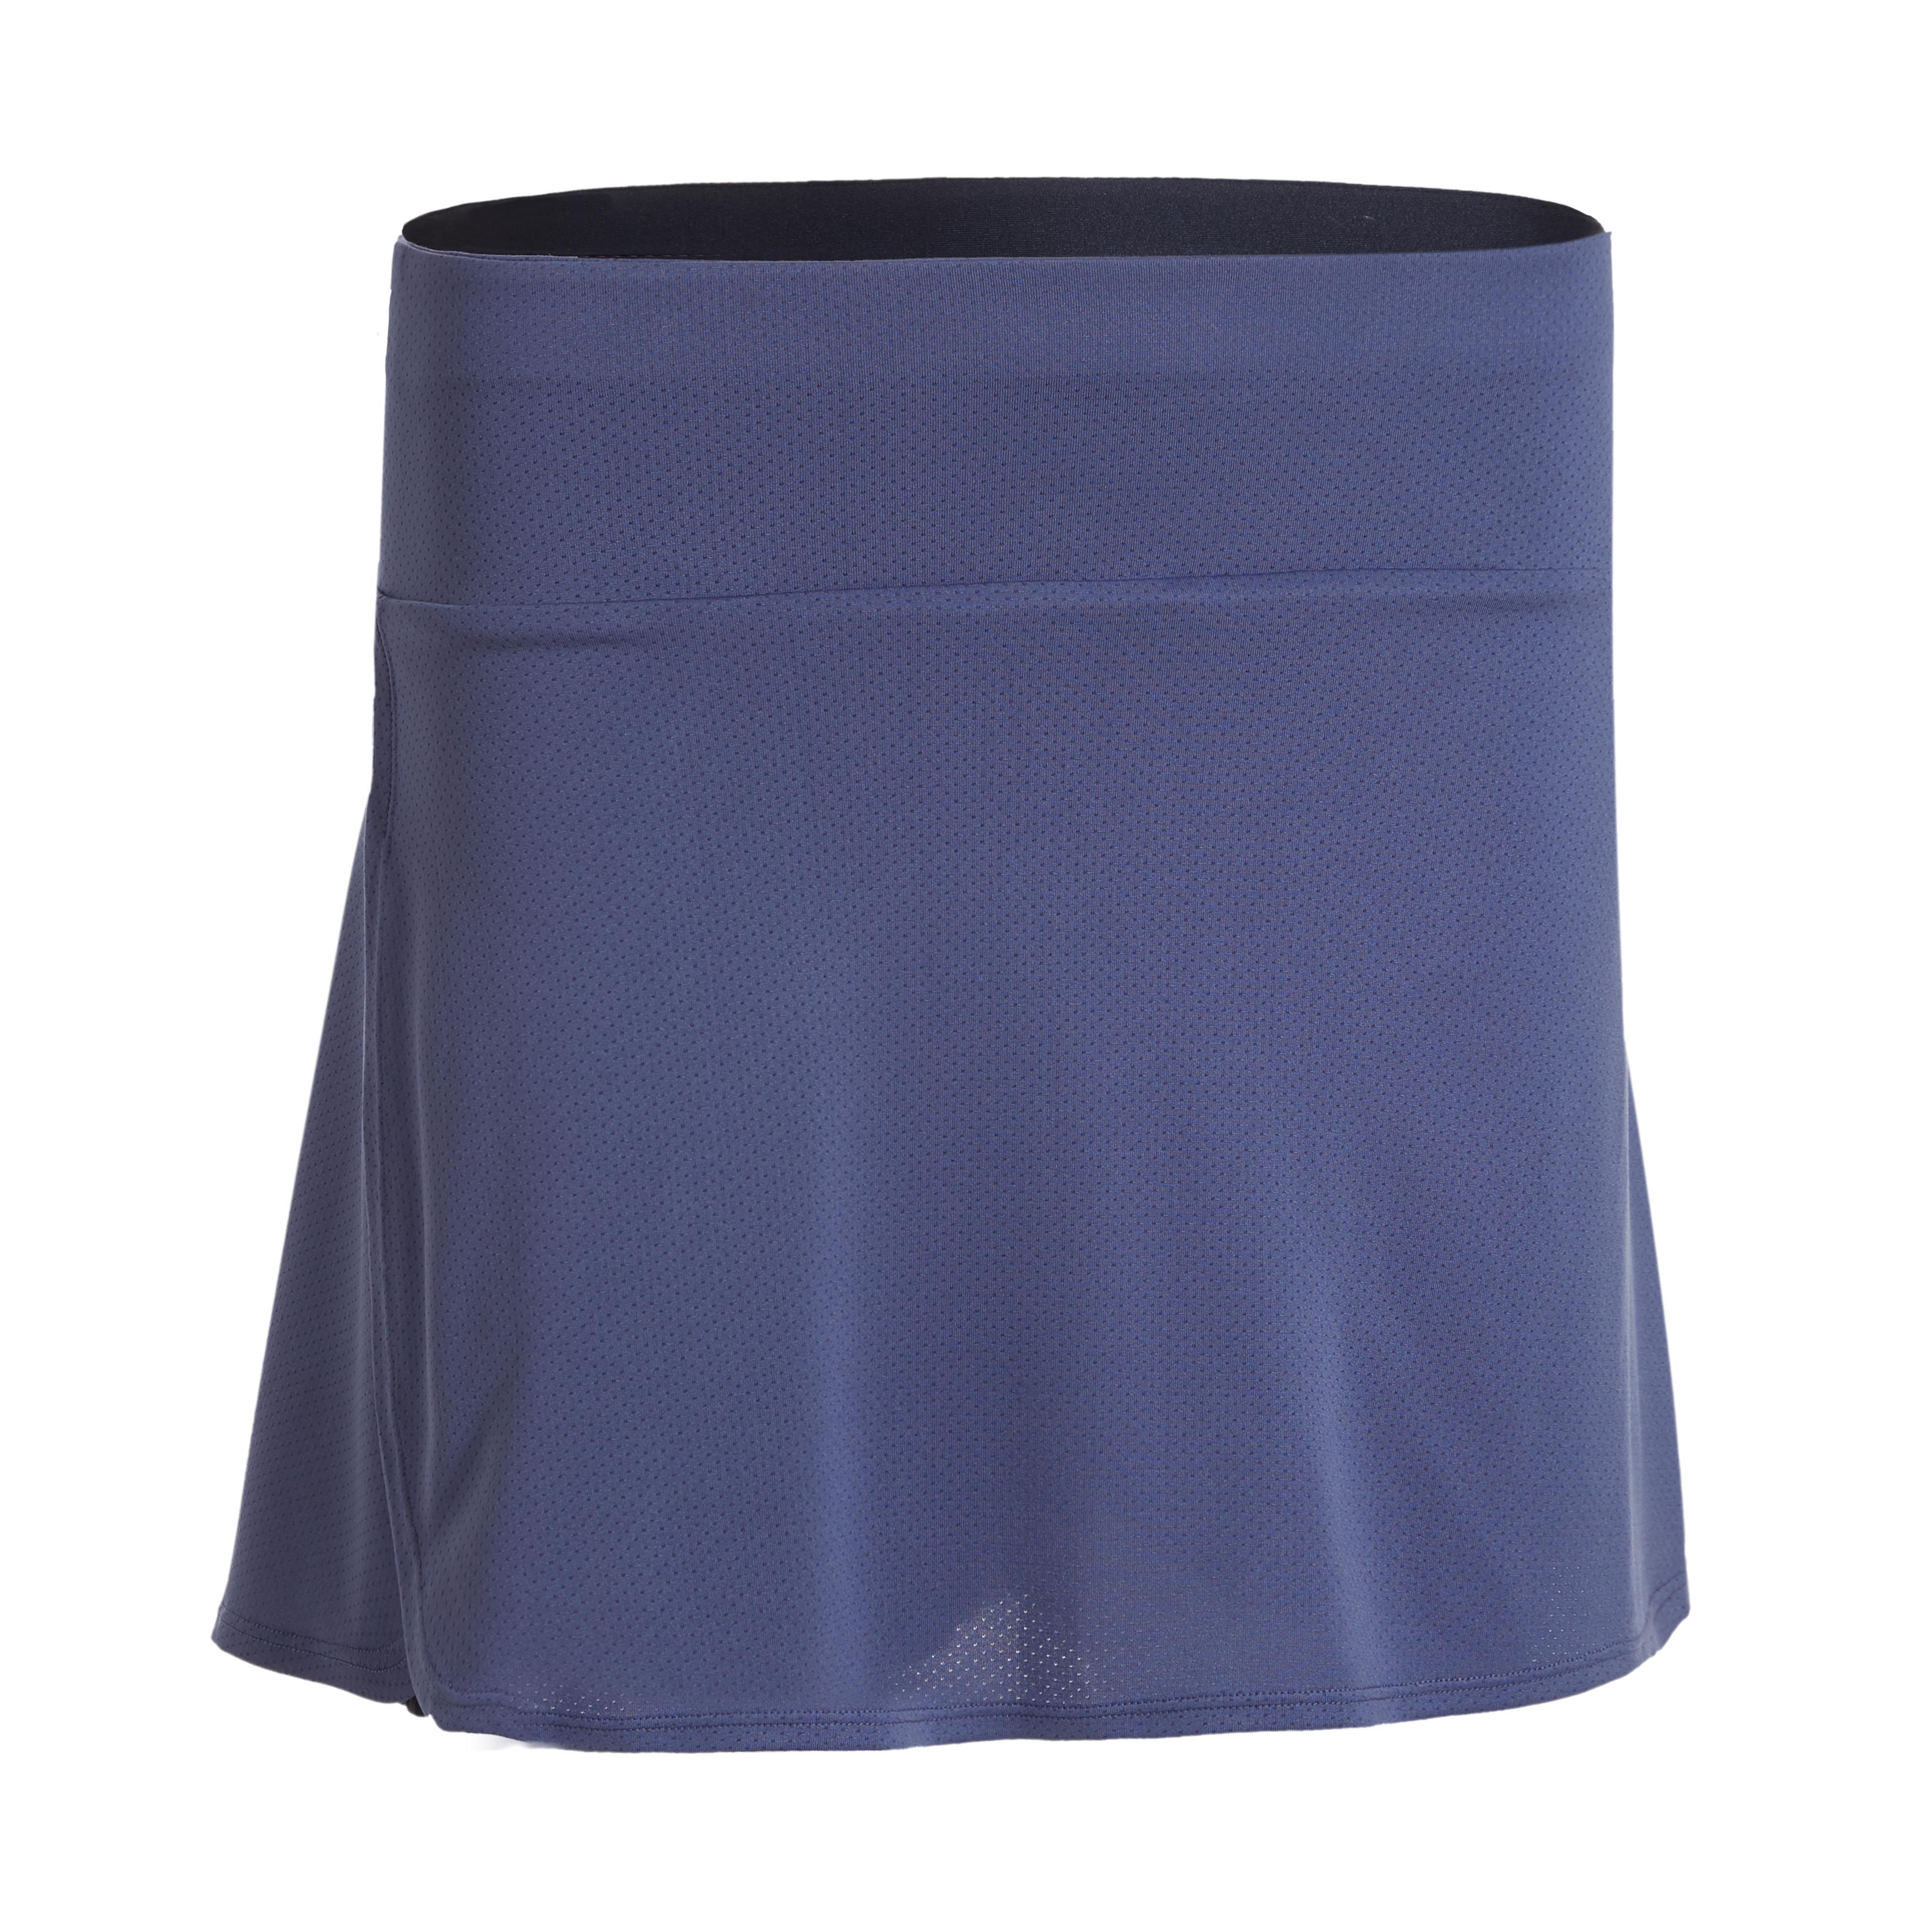 Sportrock 530 Damen grau | Bekleidung > Röcke > Sportröcke | Perfly